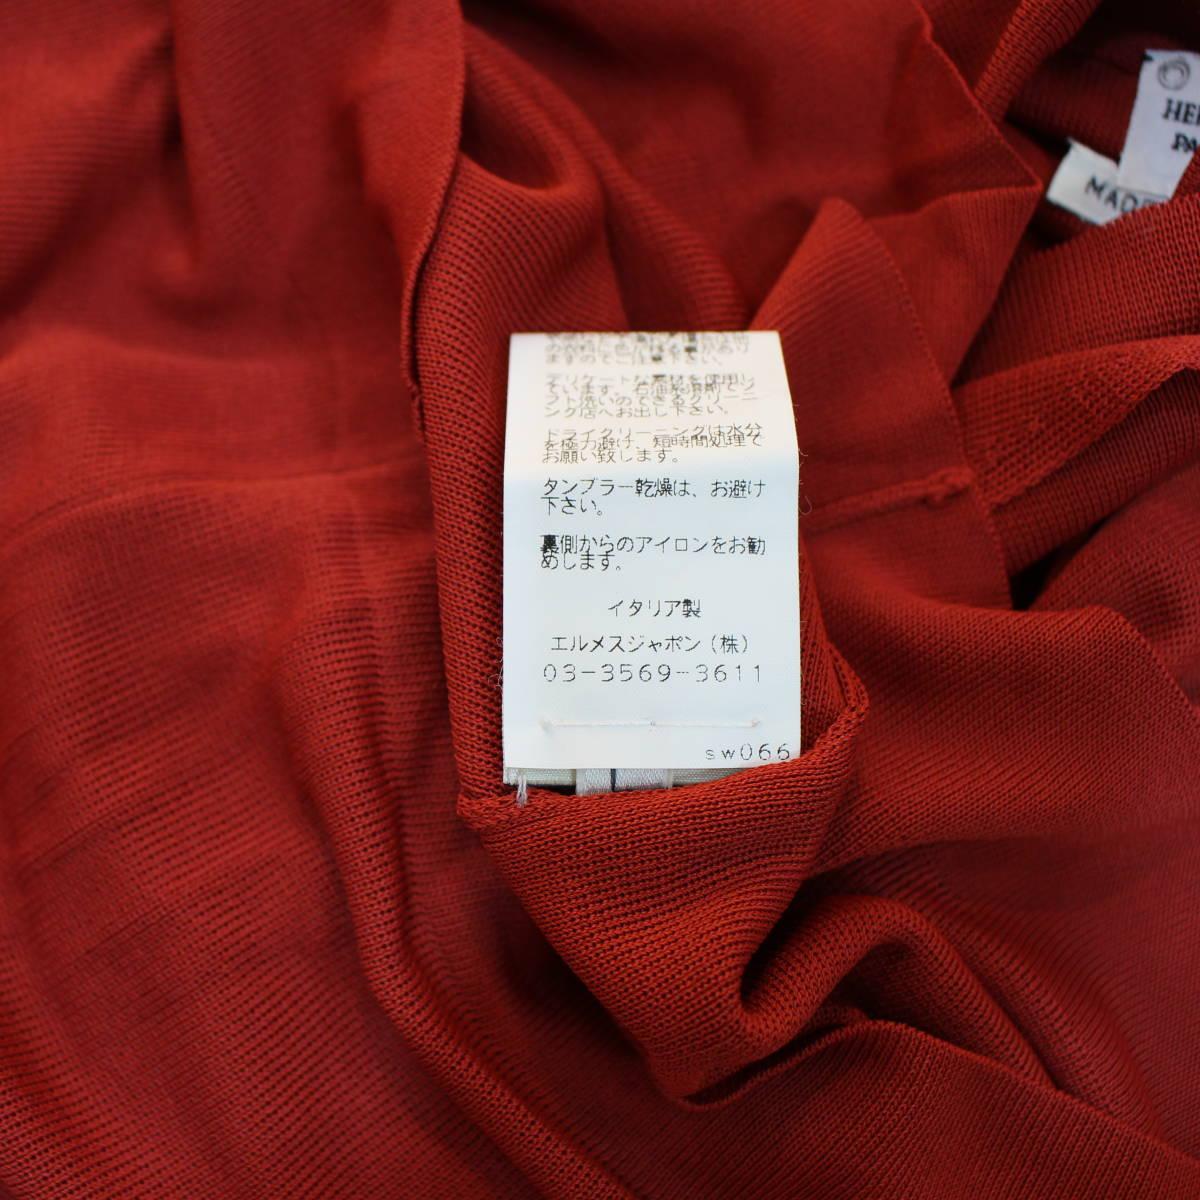 HERMES MADE BY Margiela AMERICAN SLEEVE SHIRT MADE IN ITALY/エルメスマルジェラ期アメリカンスリーブシャツ_画像7